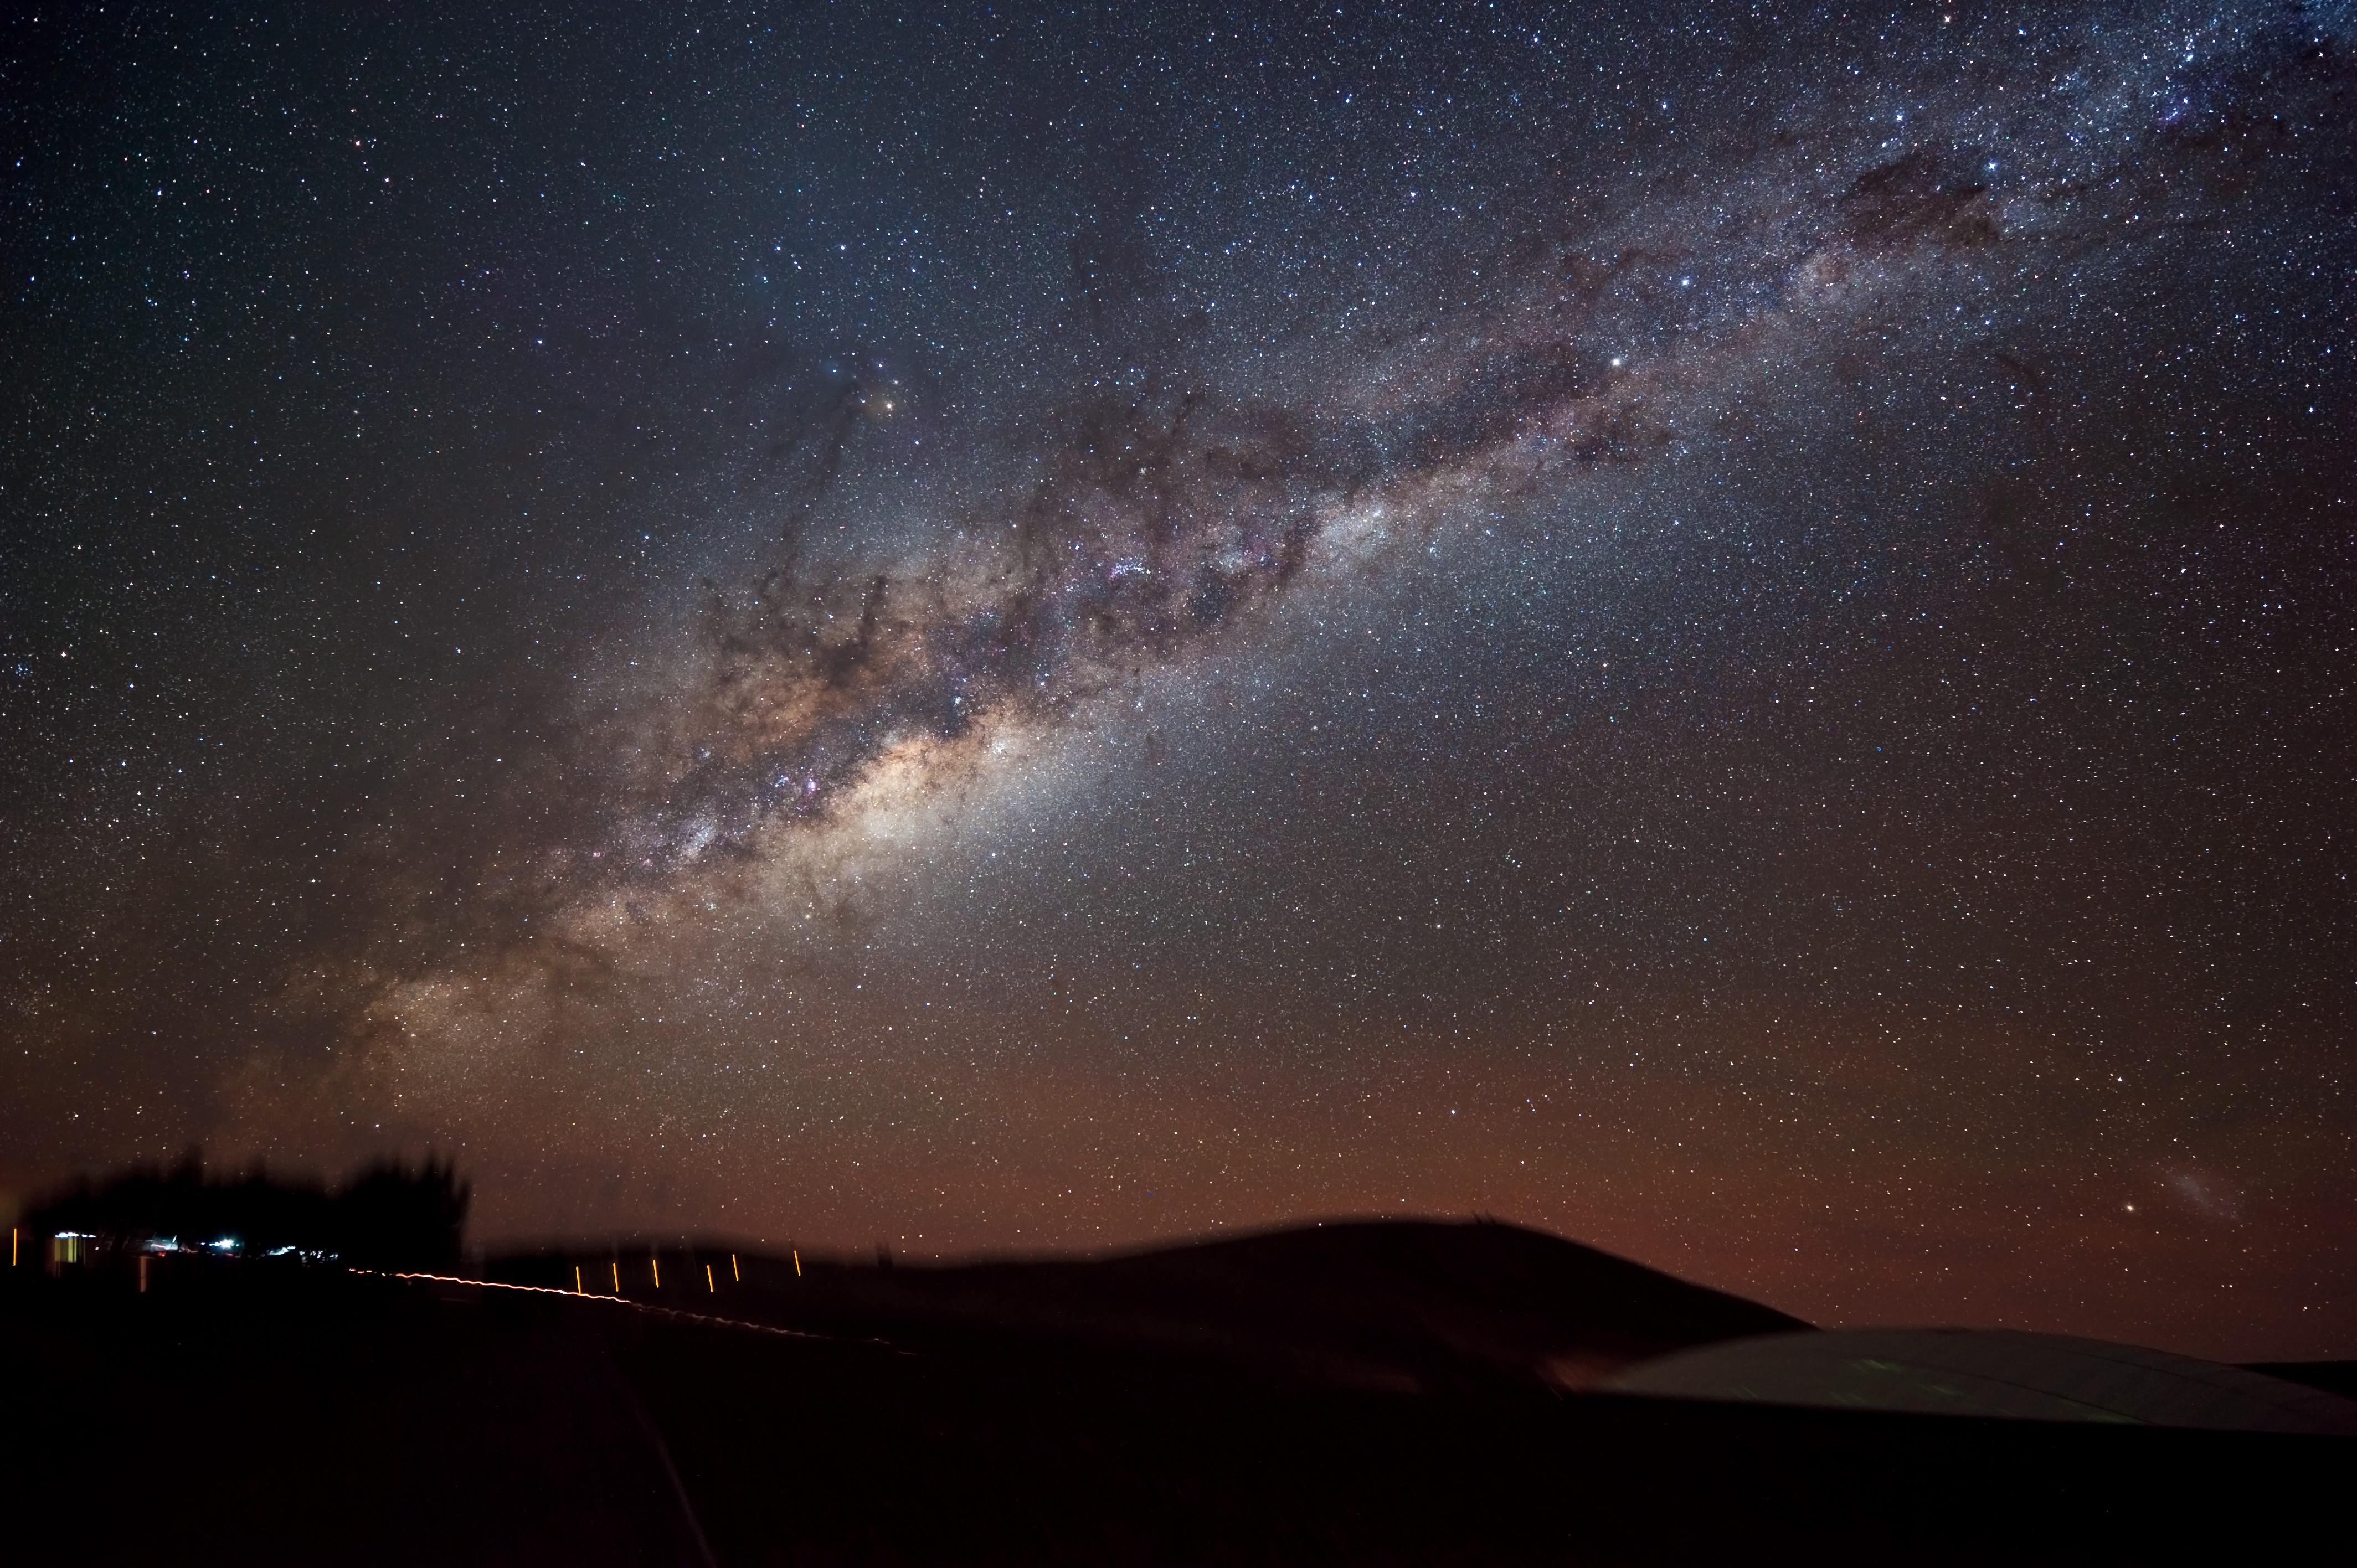 milky way galaxy edge on view - photo #44